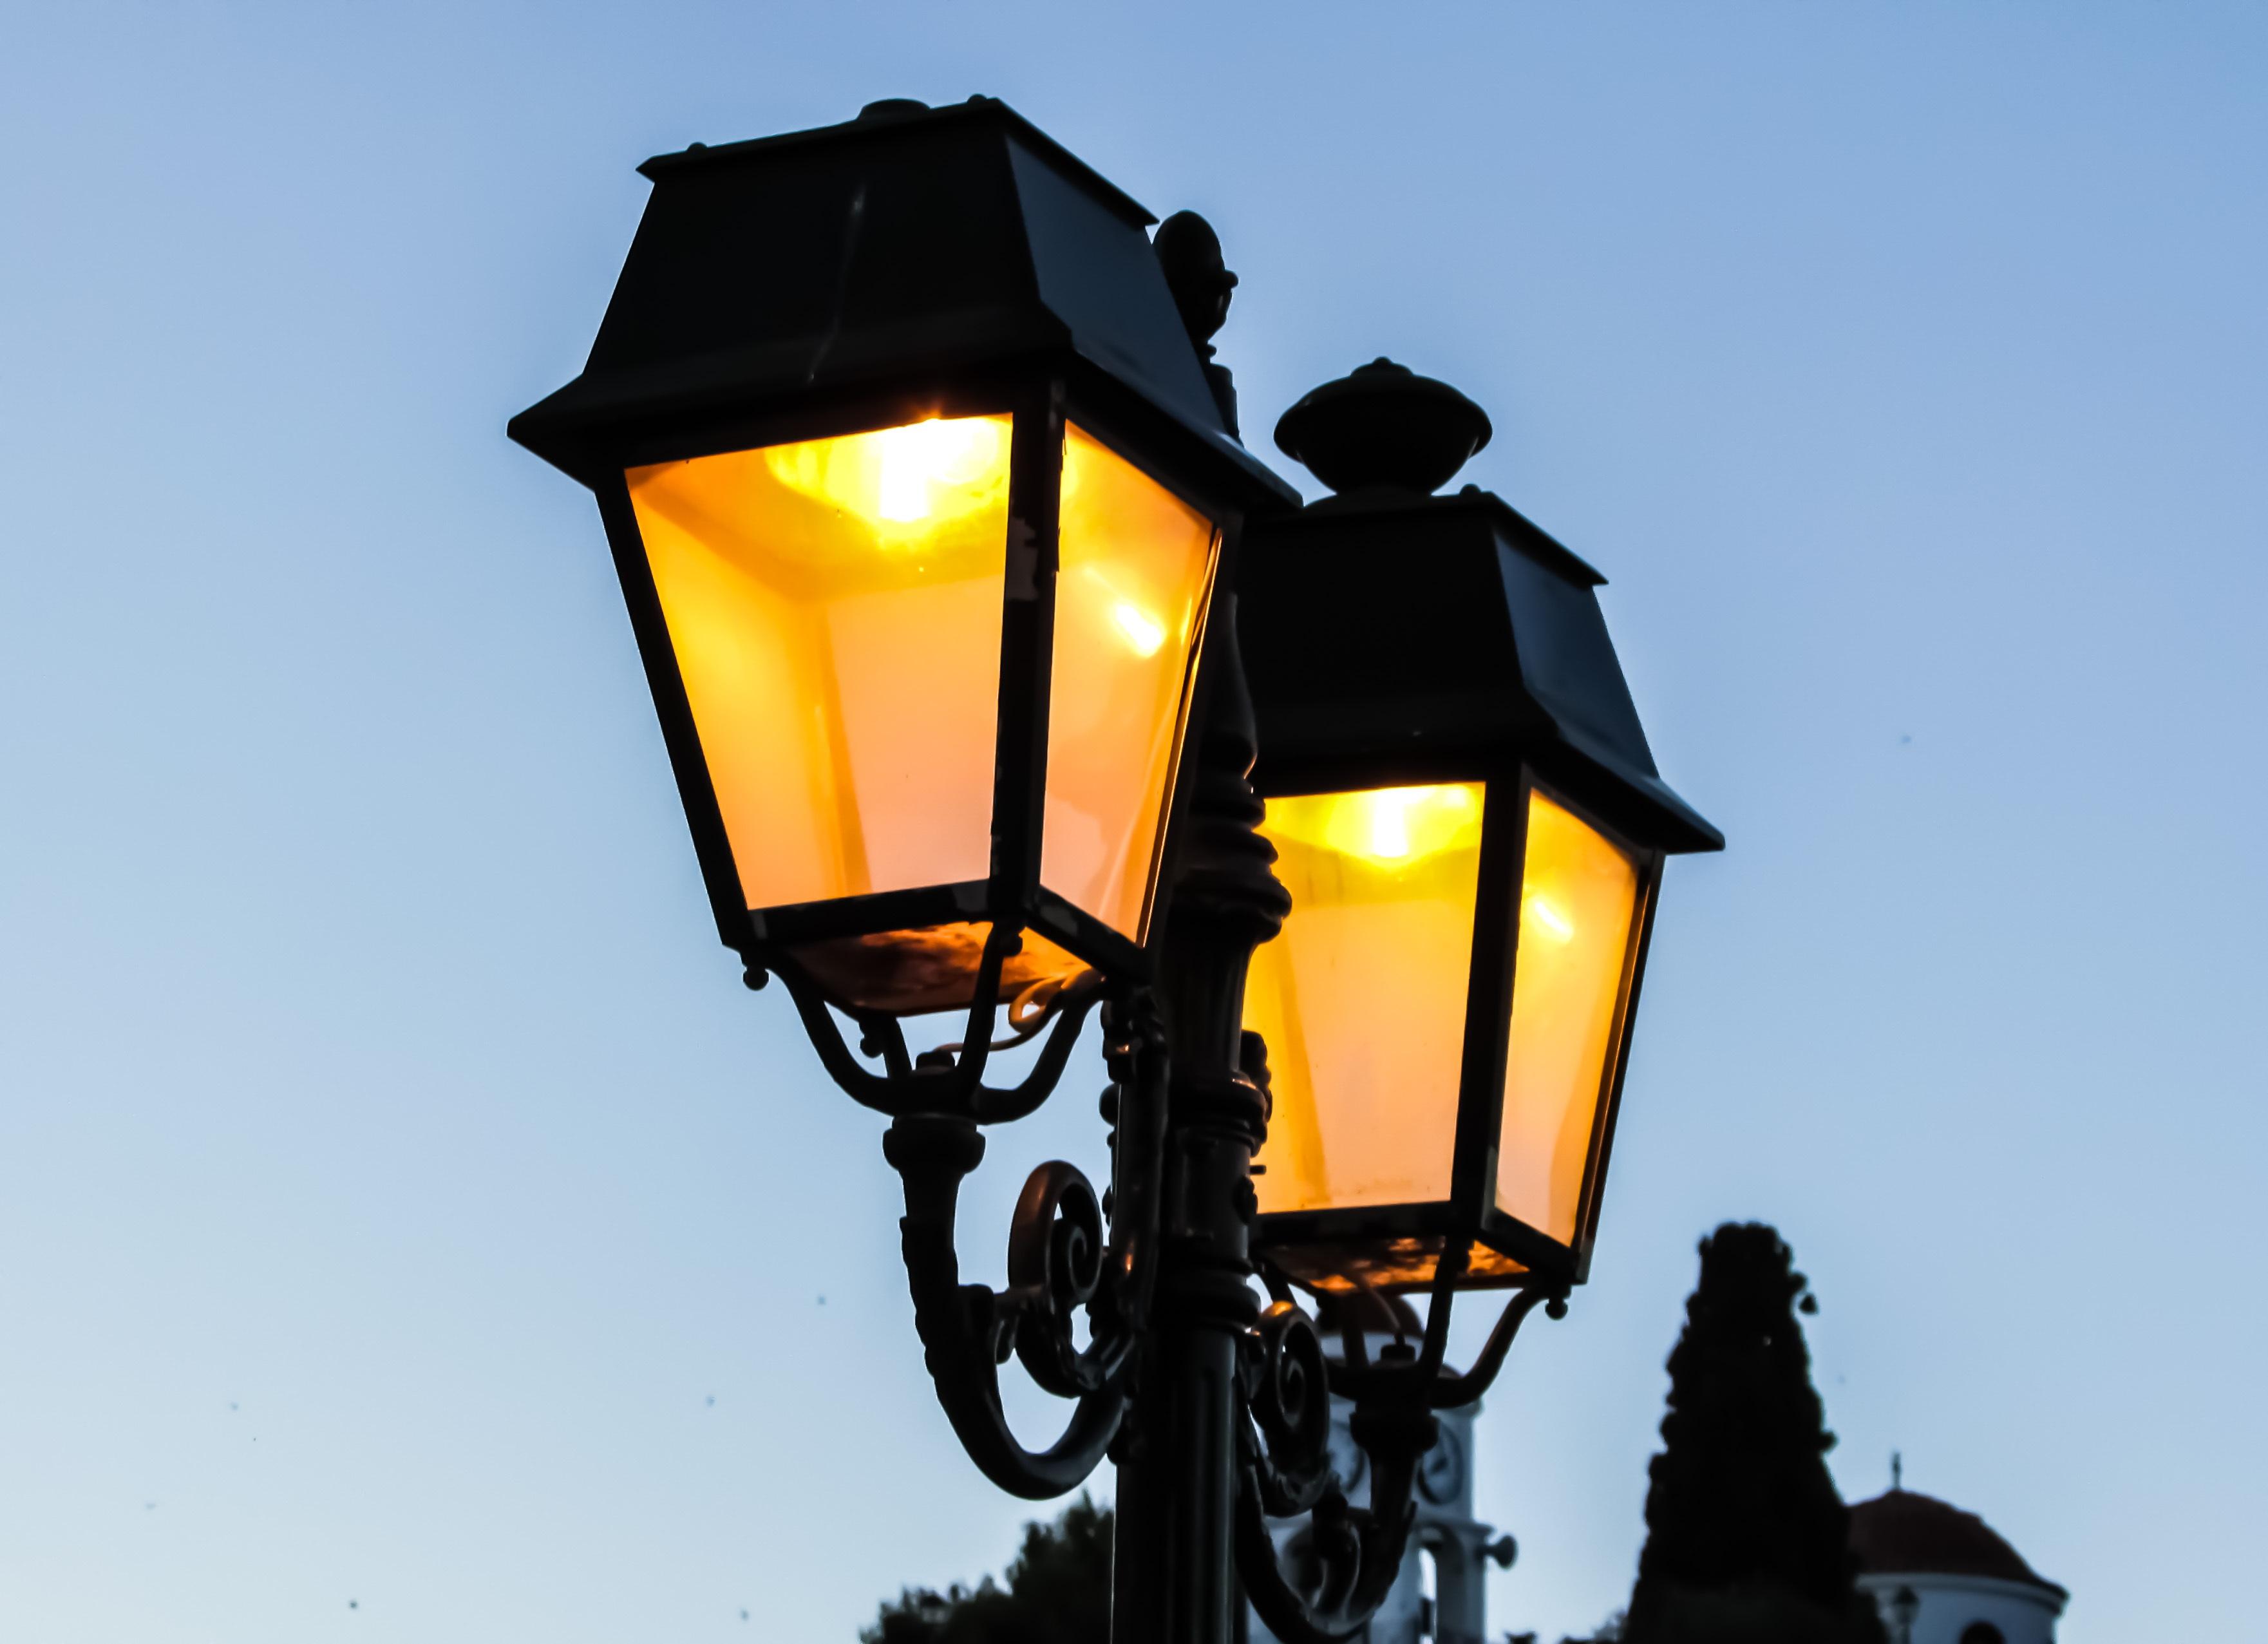 Light Summer Evening Vehicle Street Light Lamp Yellow Lighting Traffic Light  Illuminated Light Fixture Greece Elegance